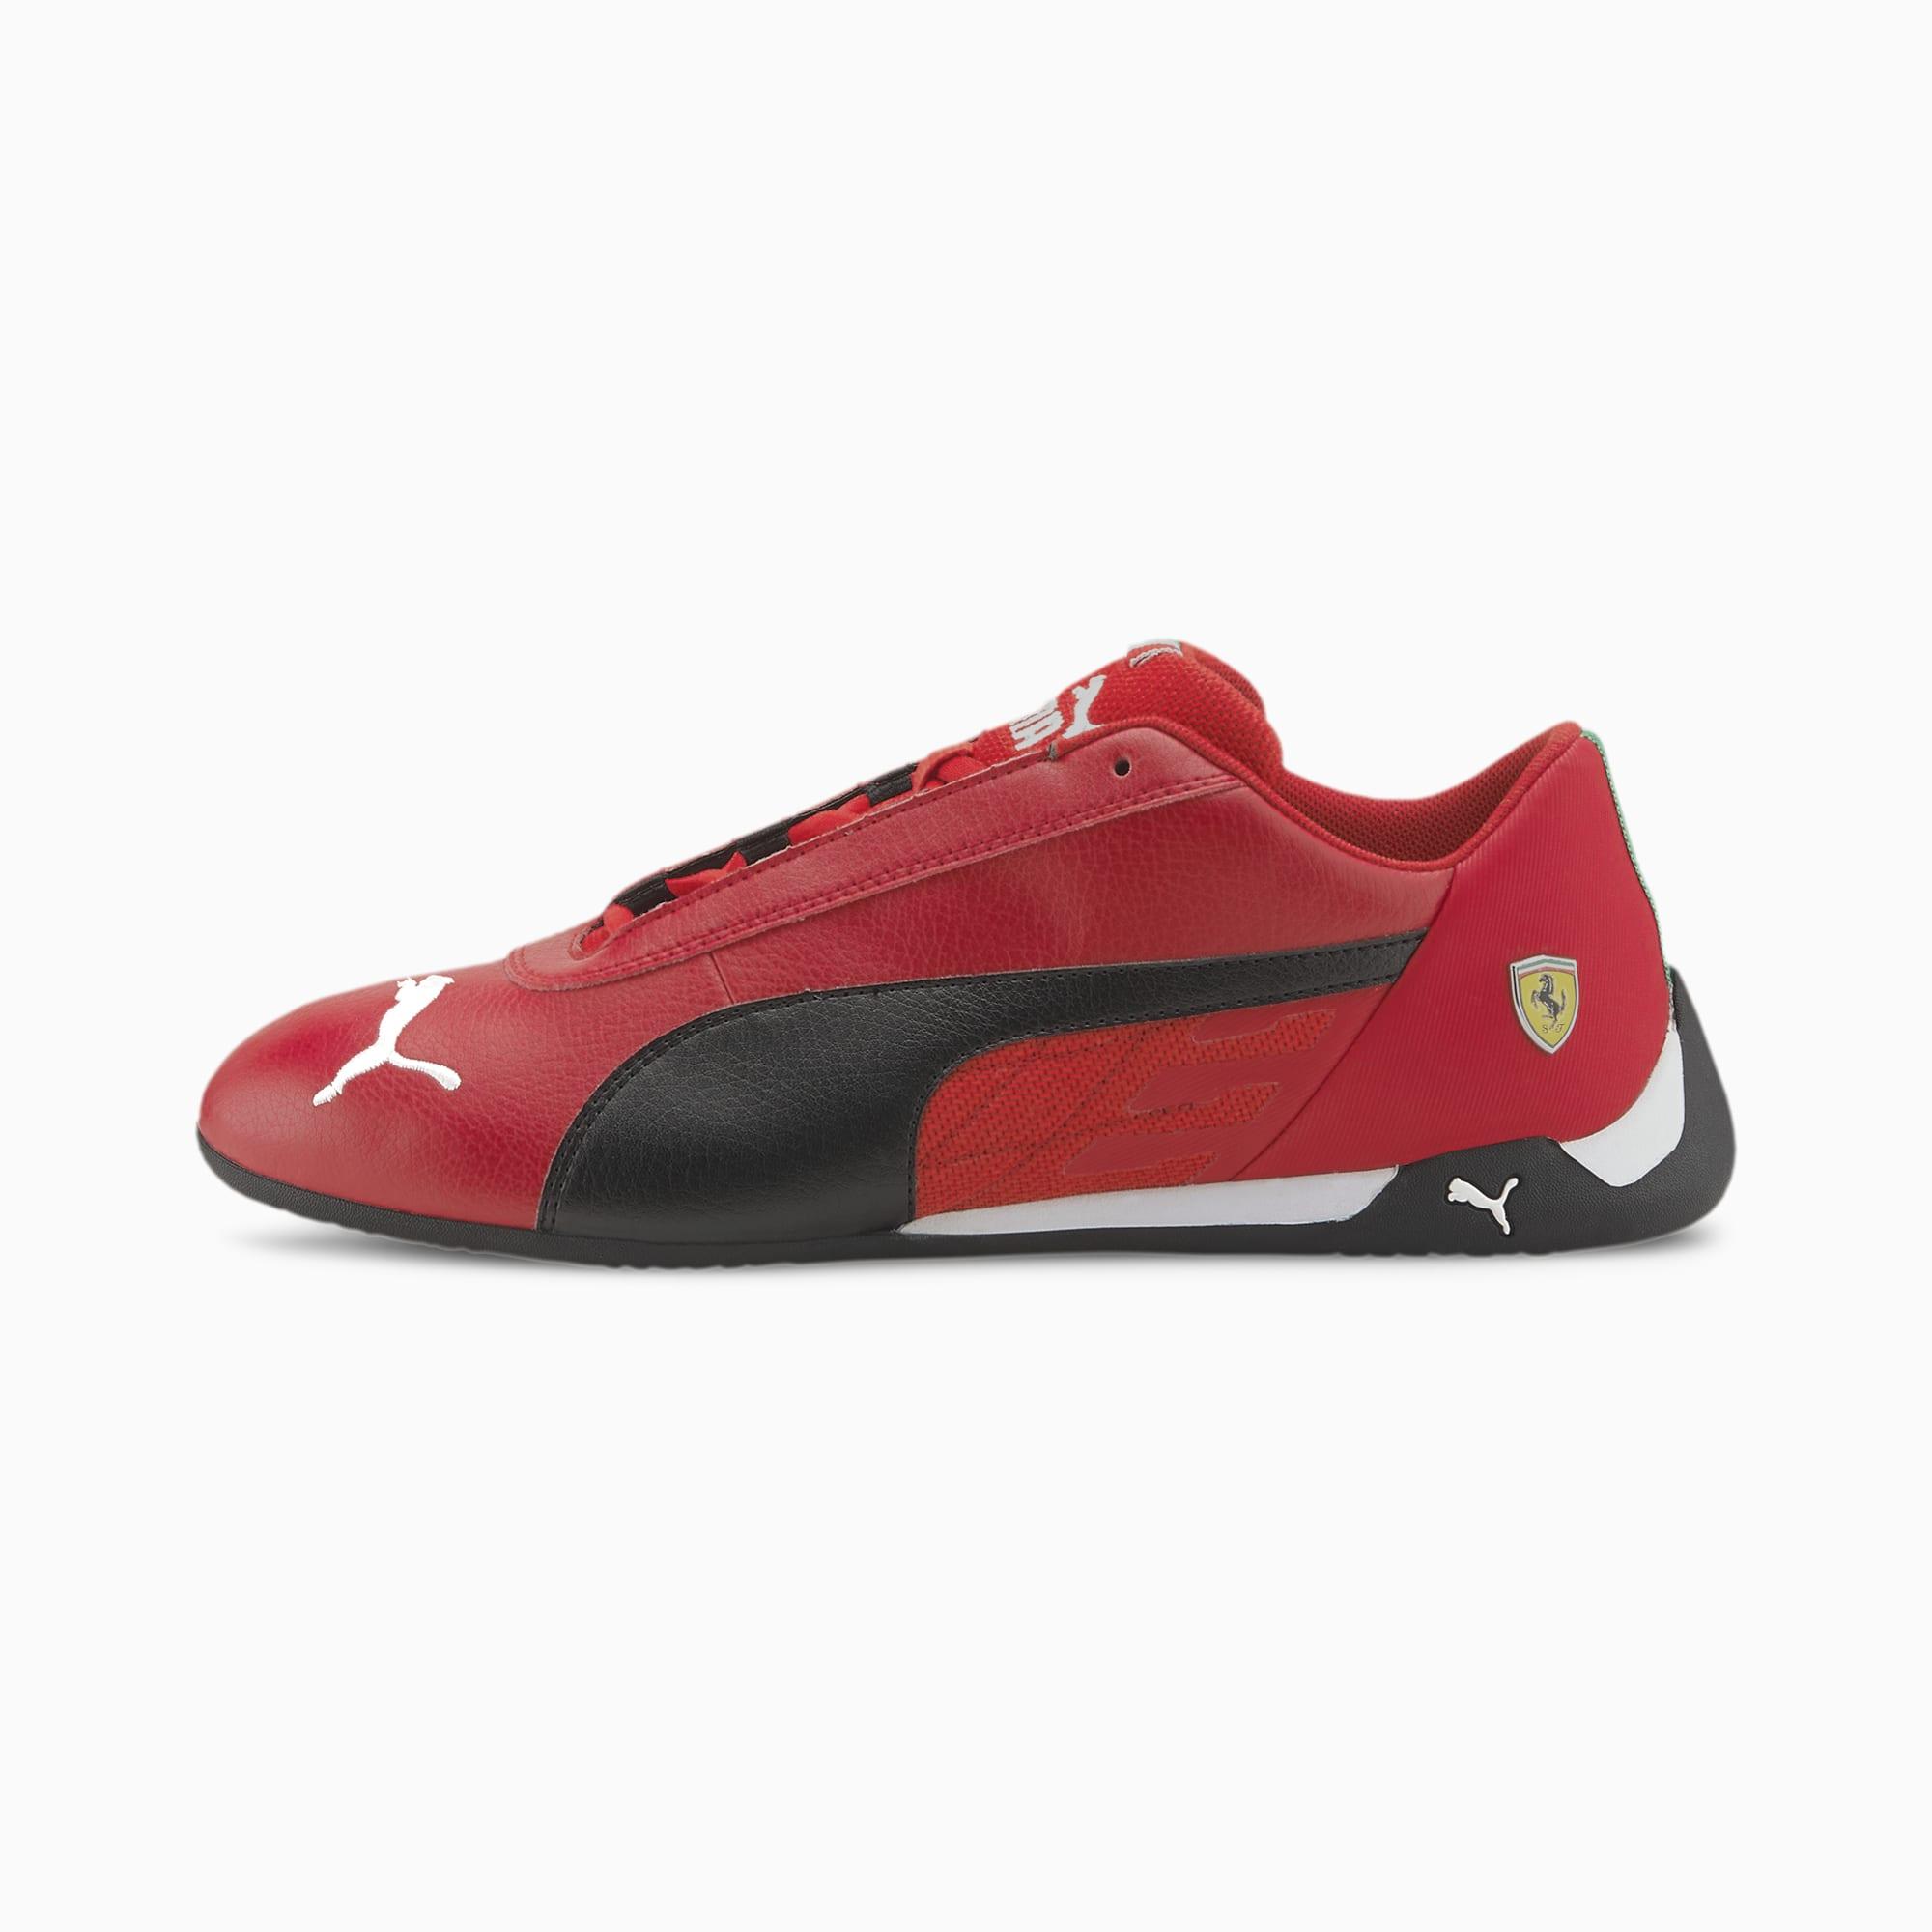 Scuderia Ferrari R-Cat Trainers